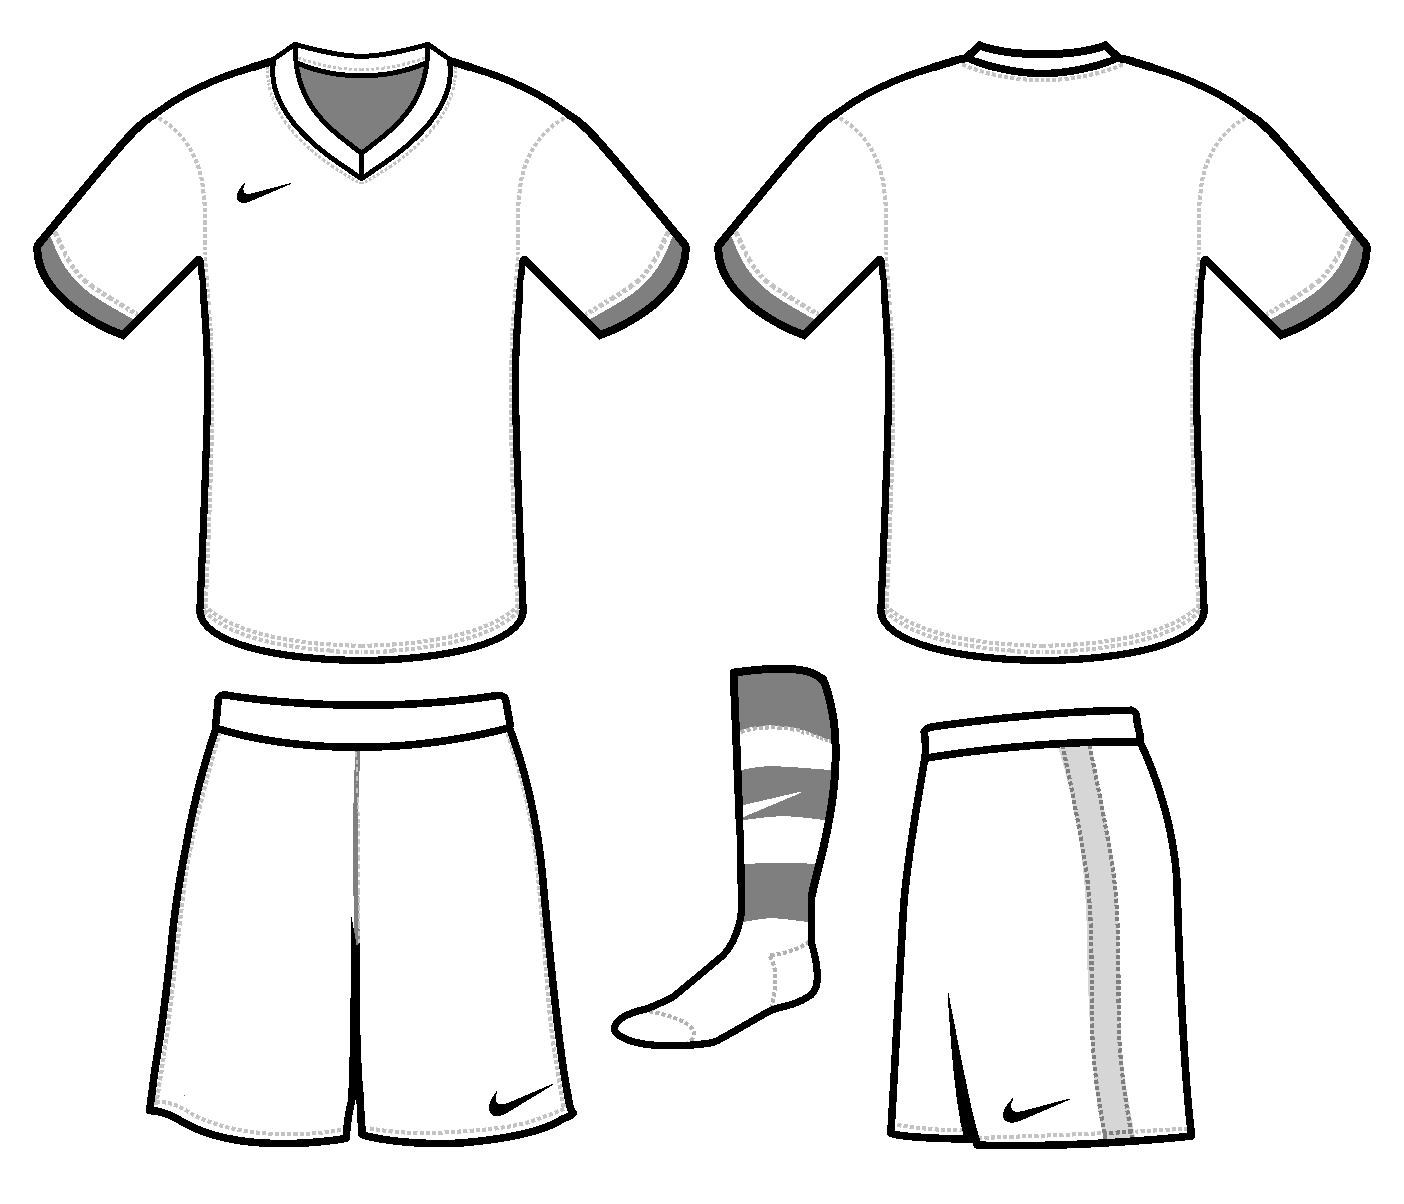 Free Blank Soccer Jersey Template